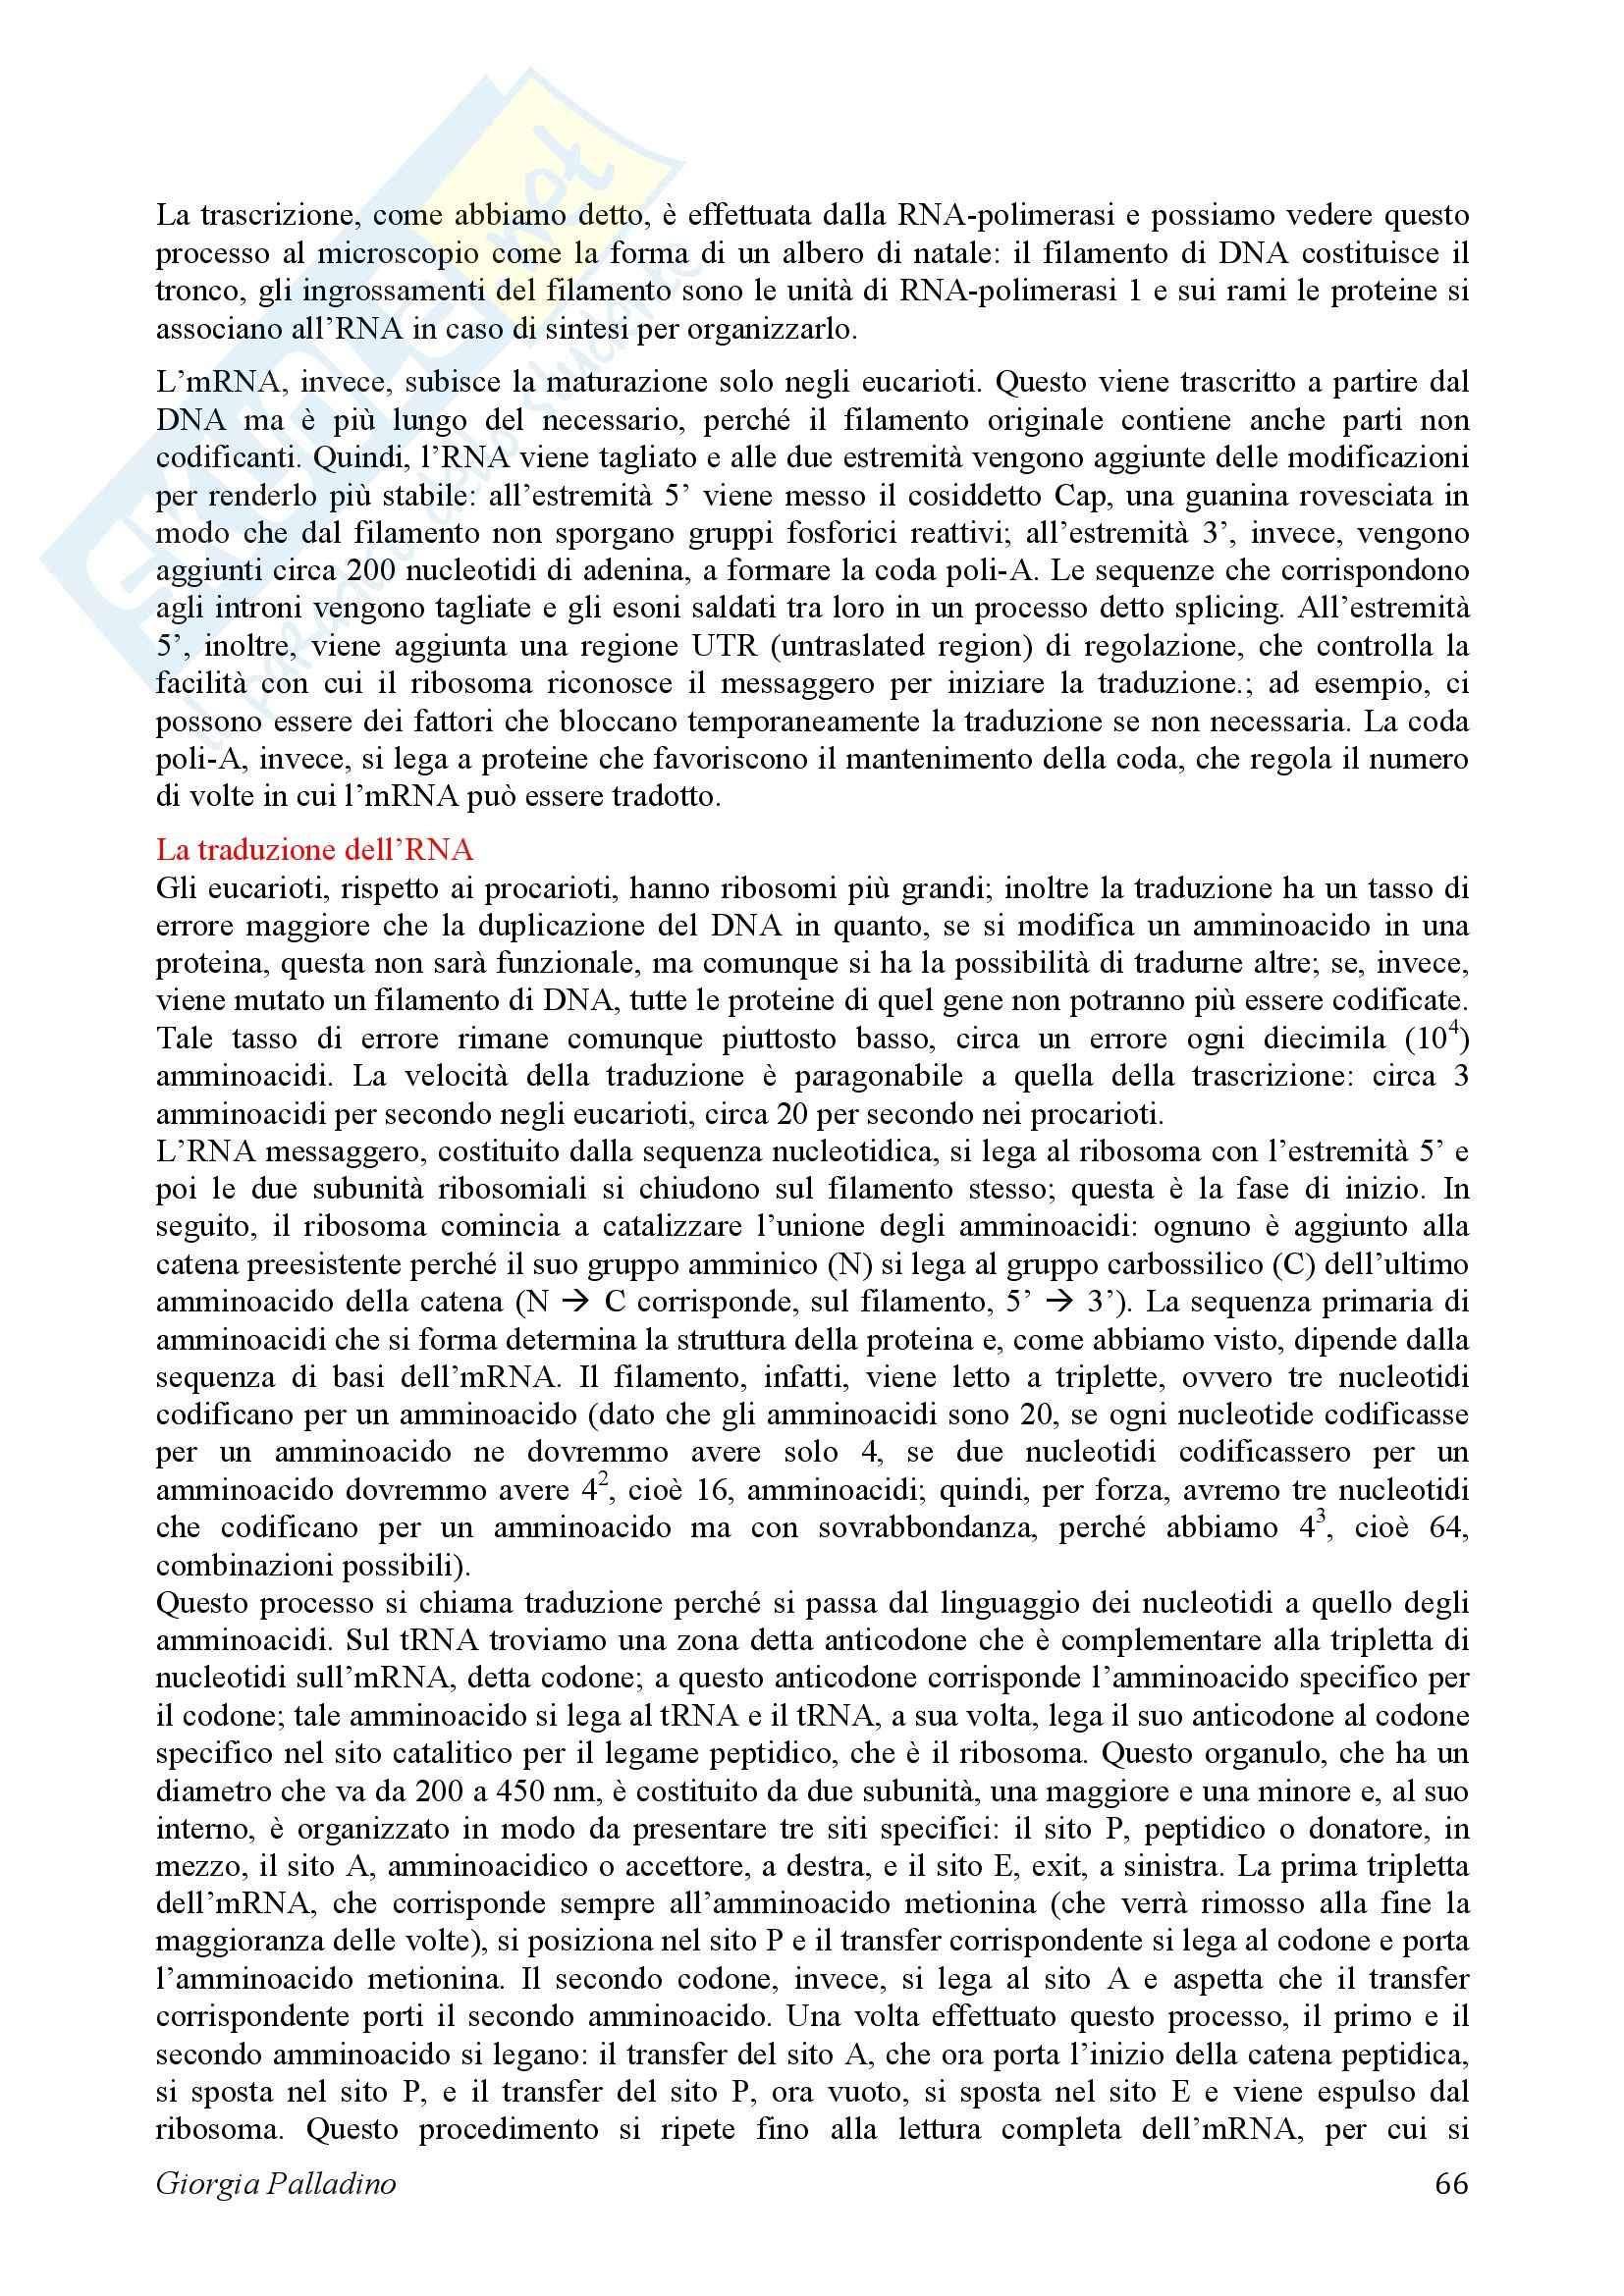 Biologia Cellulare Pag. 66